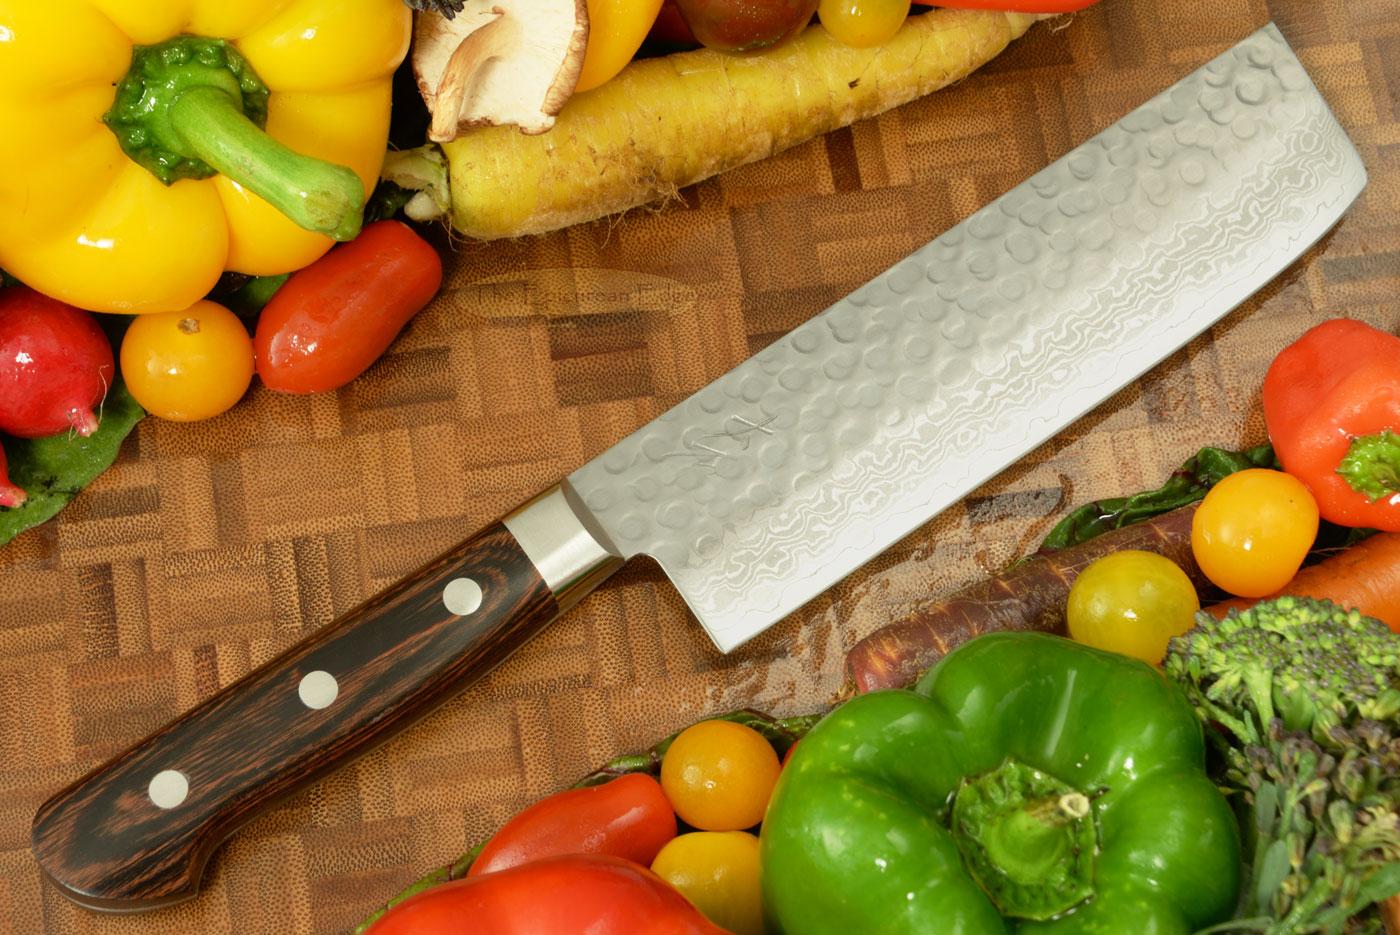 Vegetable Knife - Nakiri - 6 3/4 in. (170mm) WGAU17-06-5sp